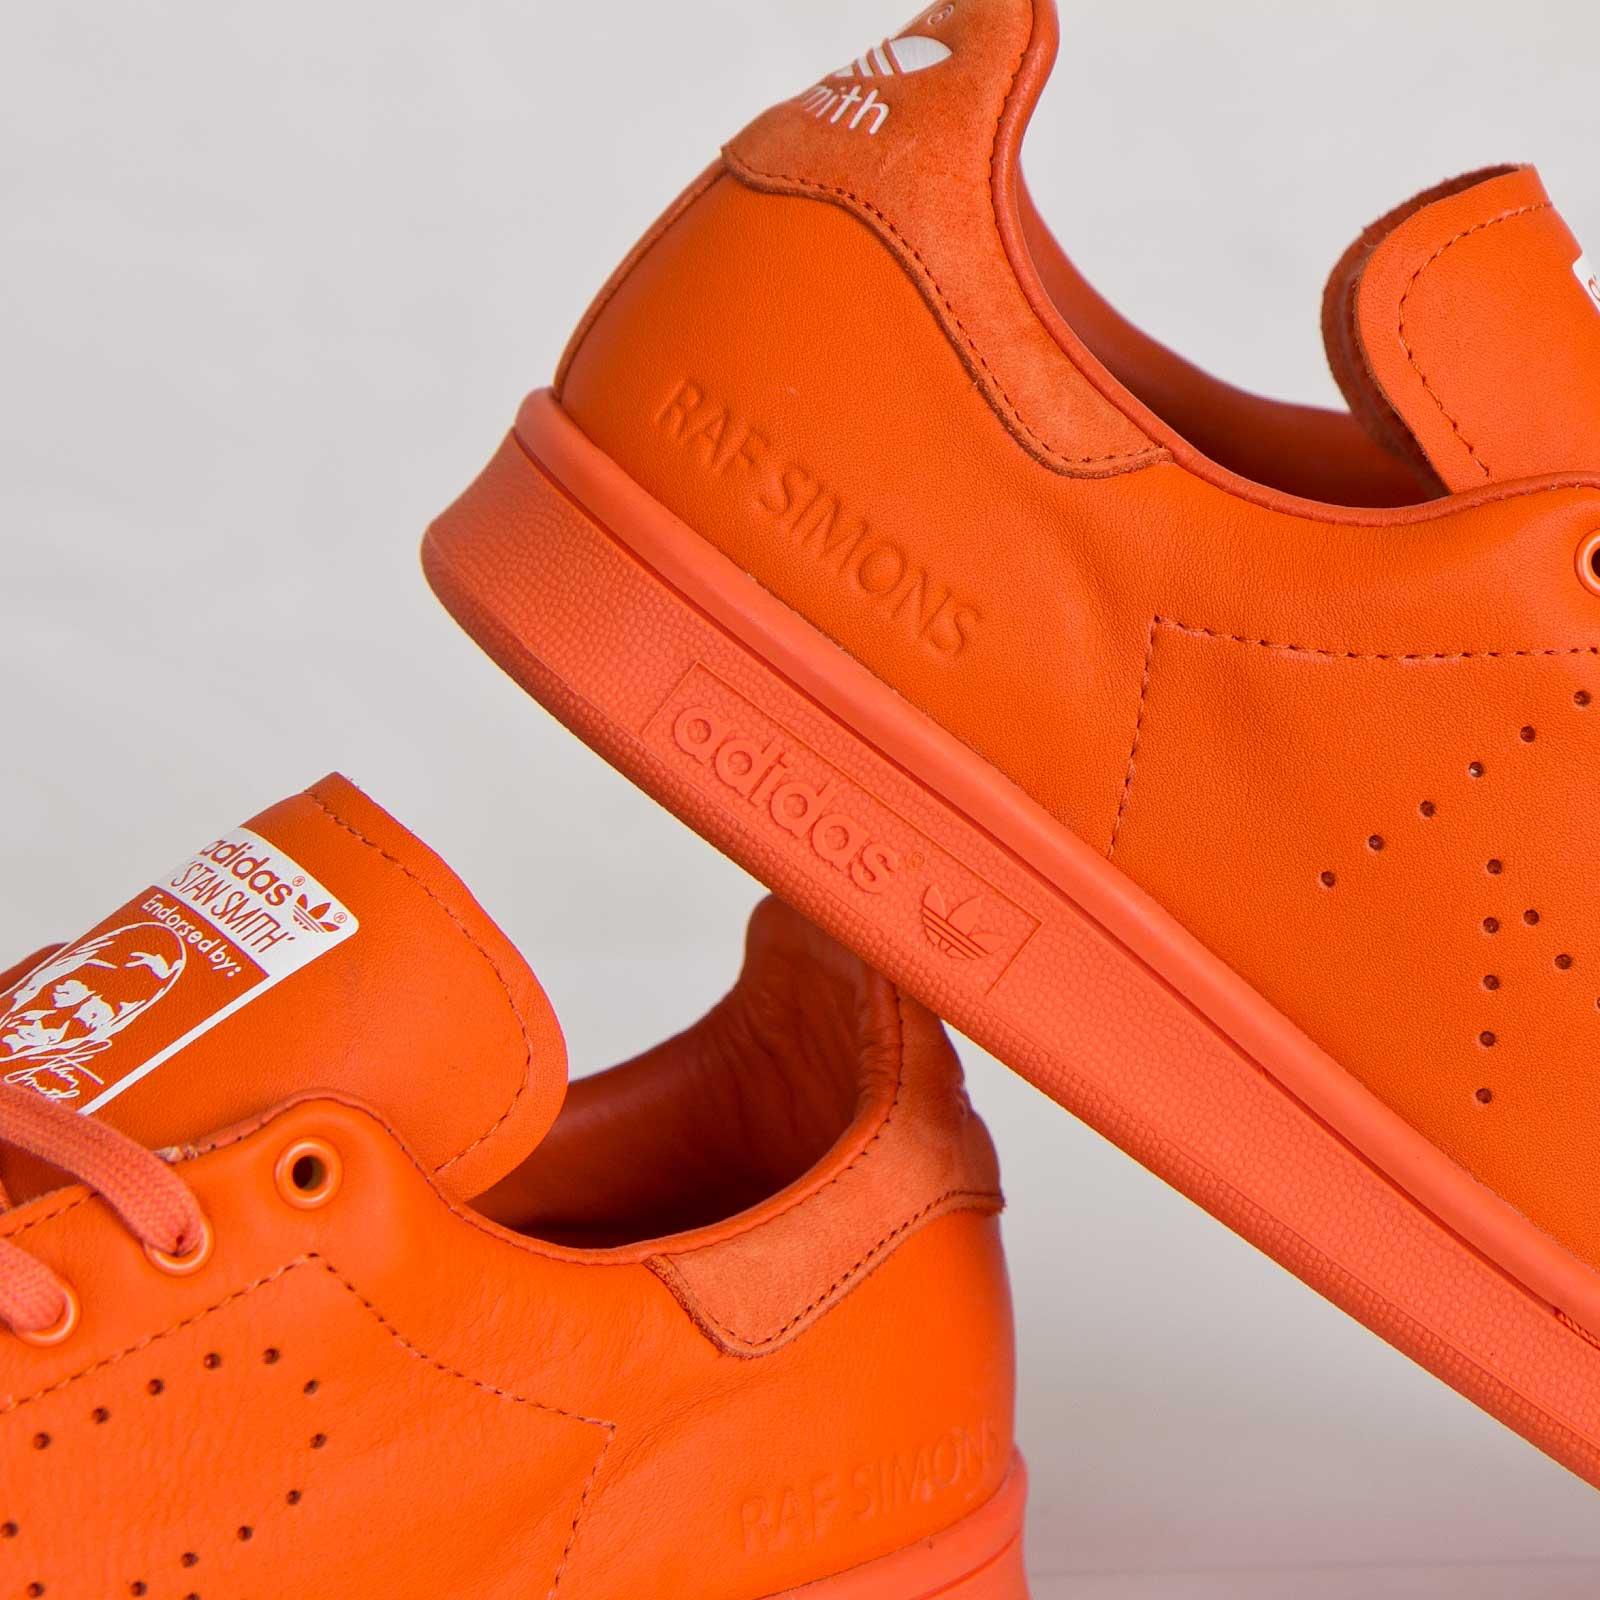 naranja naranja adidas by raf 7e95b simons clearance prices db29e 7e95b raf 376fae